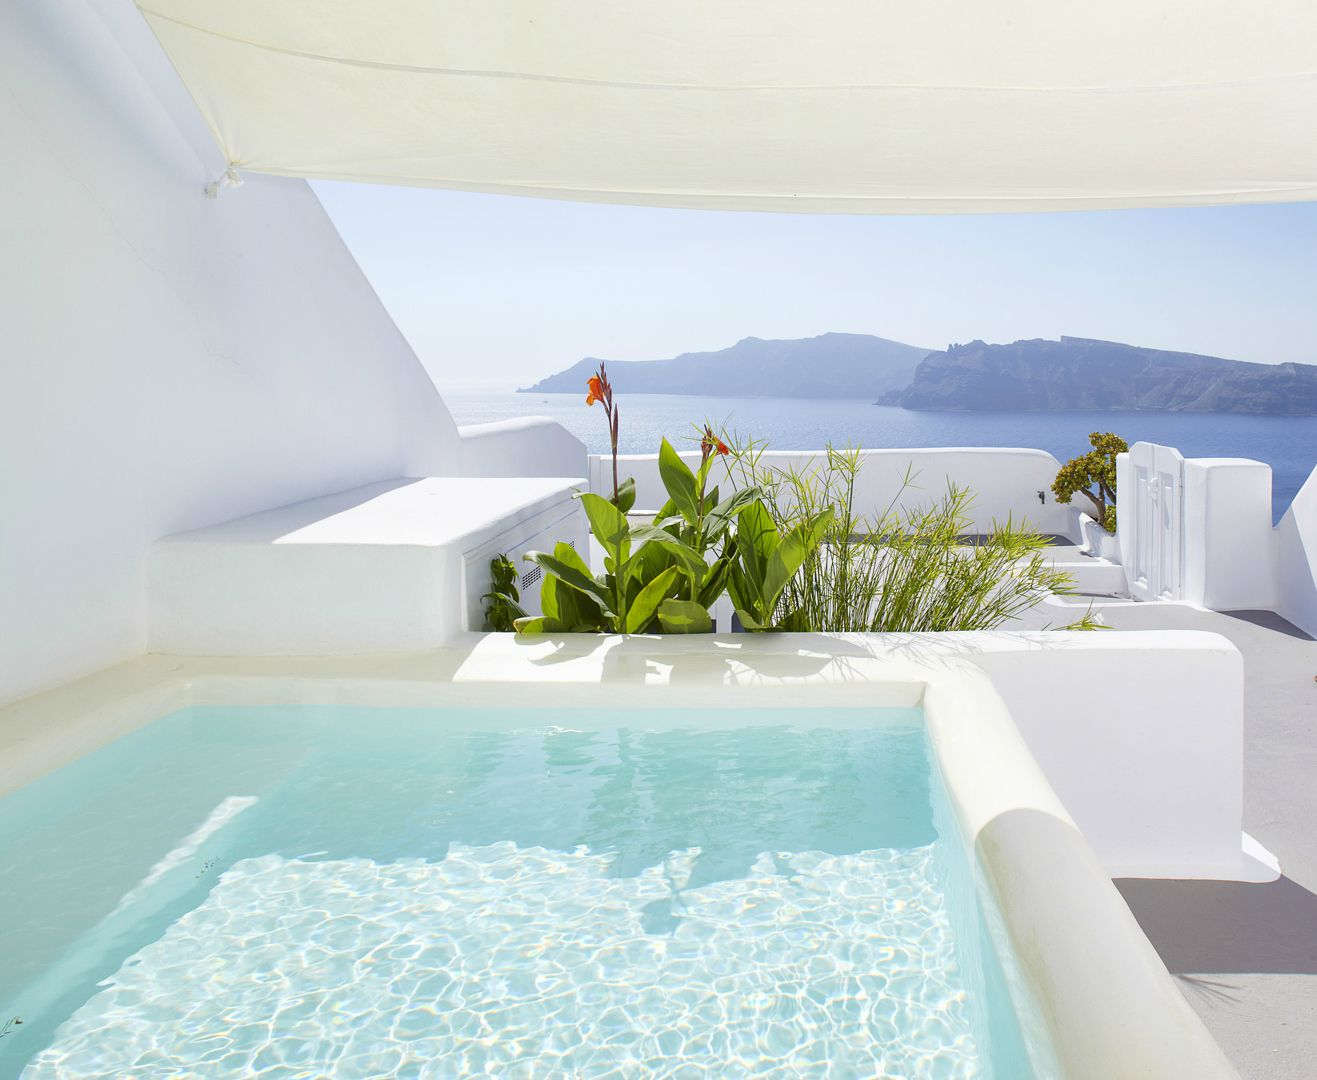 Piscina elevada architecture ideas shipping container for Construccion de piscinas precios chile